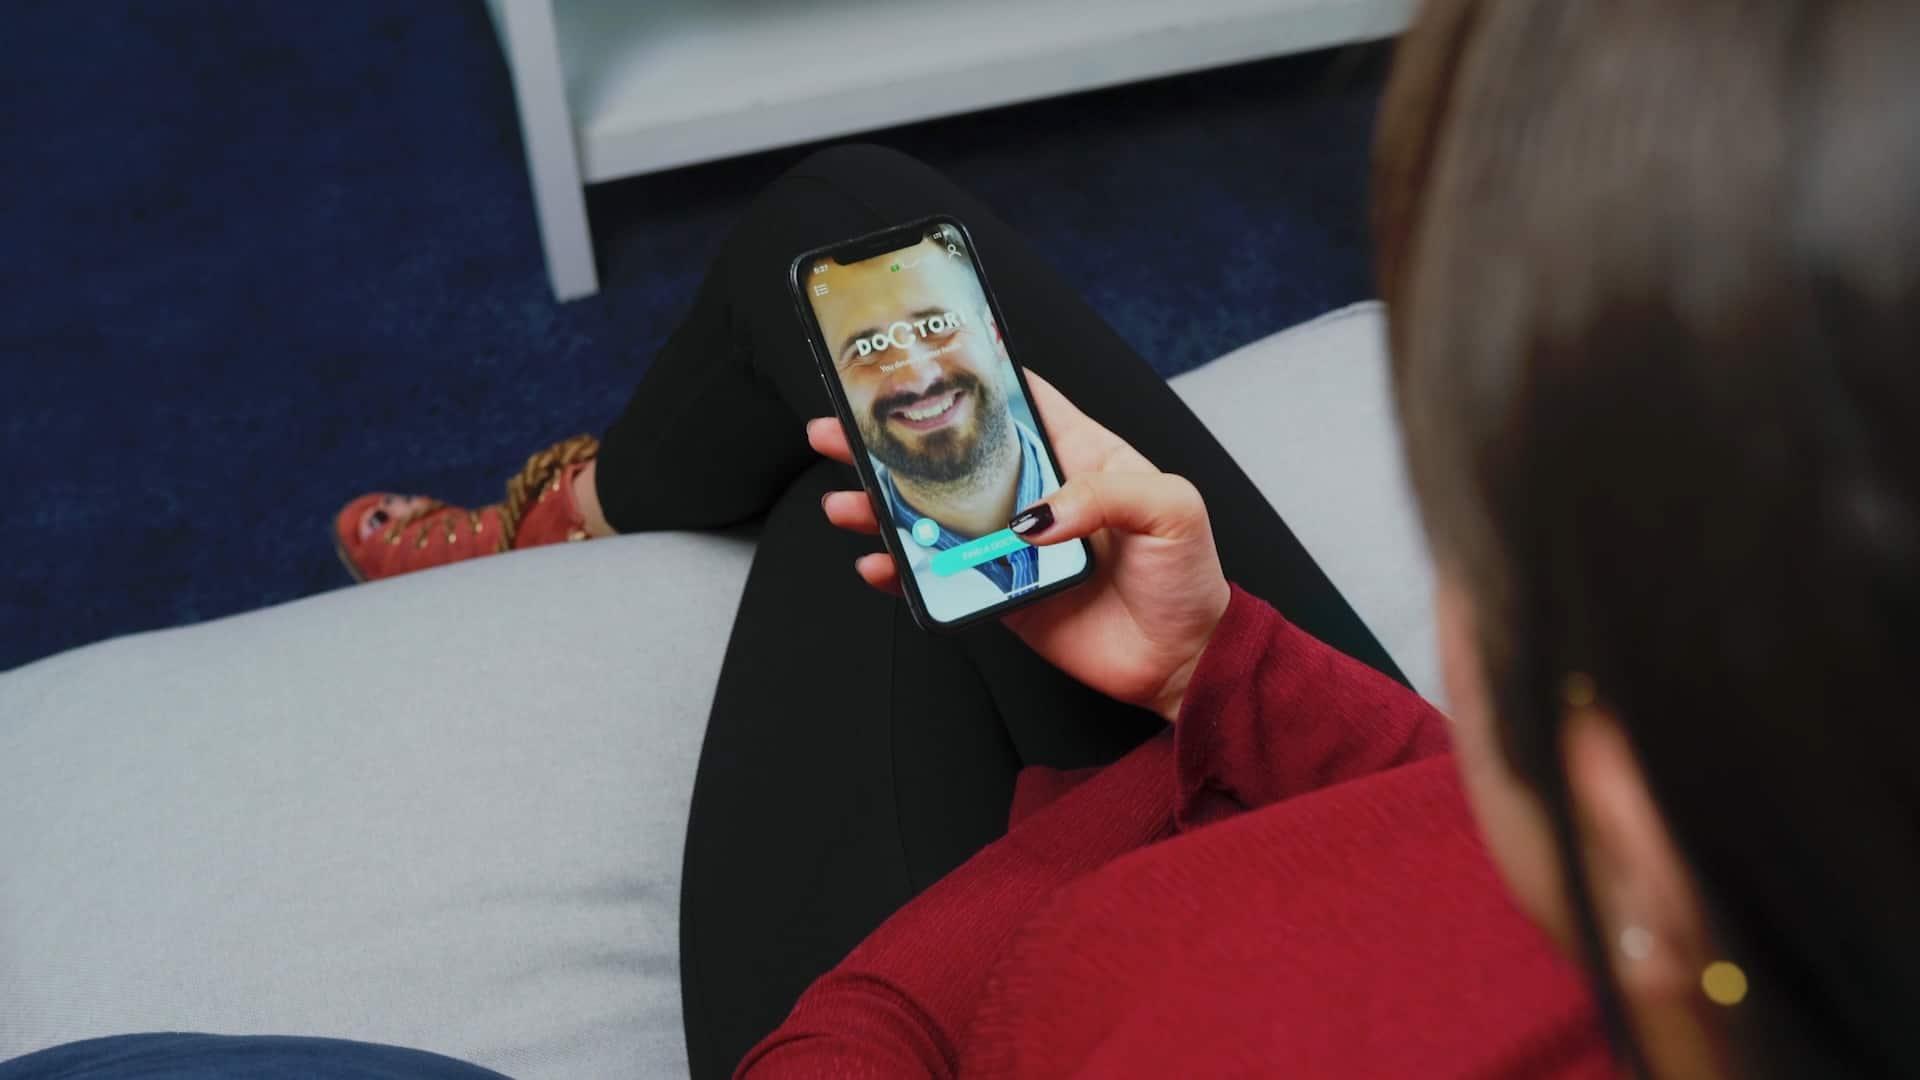 Doctori: Virtual Medical Visits